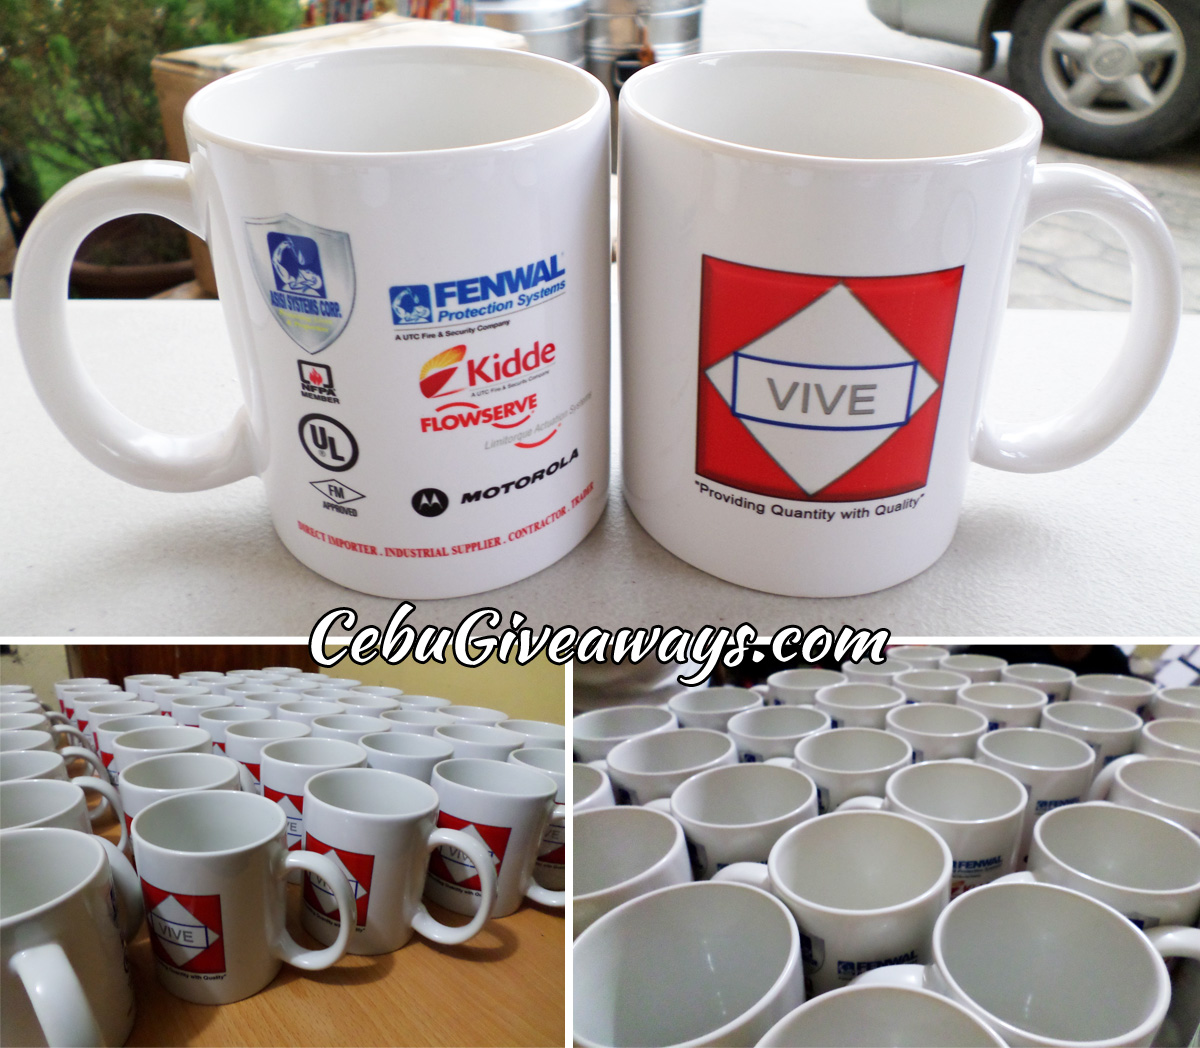 Personalized mugs price divisoria - Personalized Mugs Price Divisoria Personalized Mugs Price Divisoria Personalized Mugs Price Divisoria Personalized Mugs Price